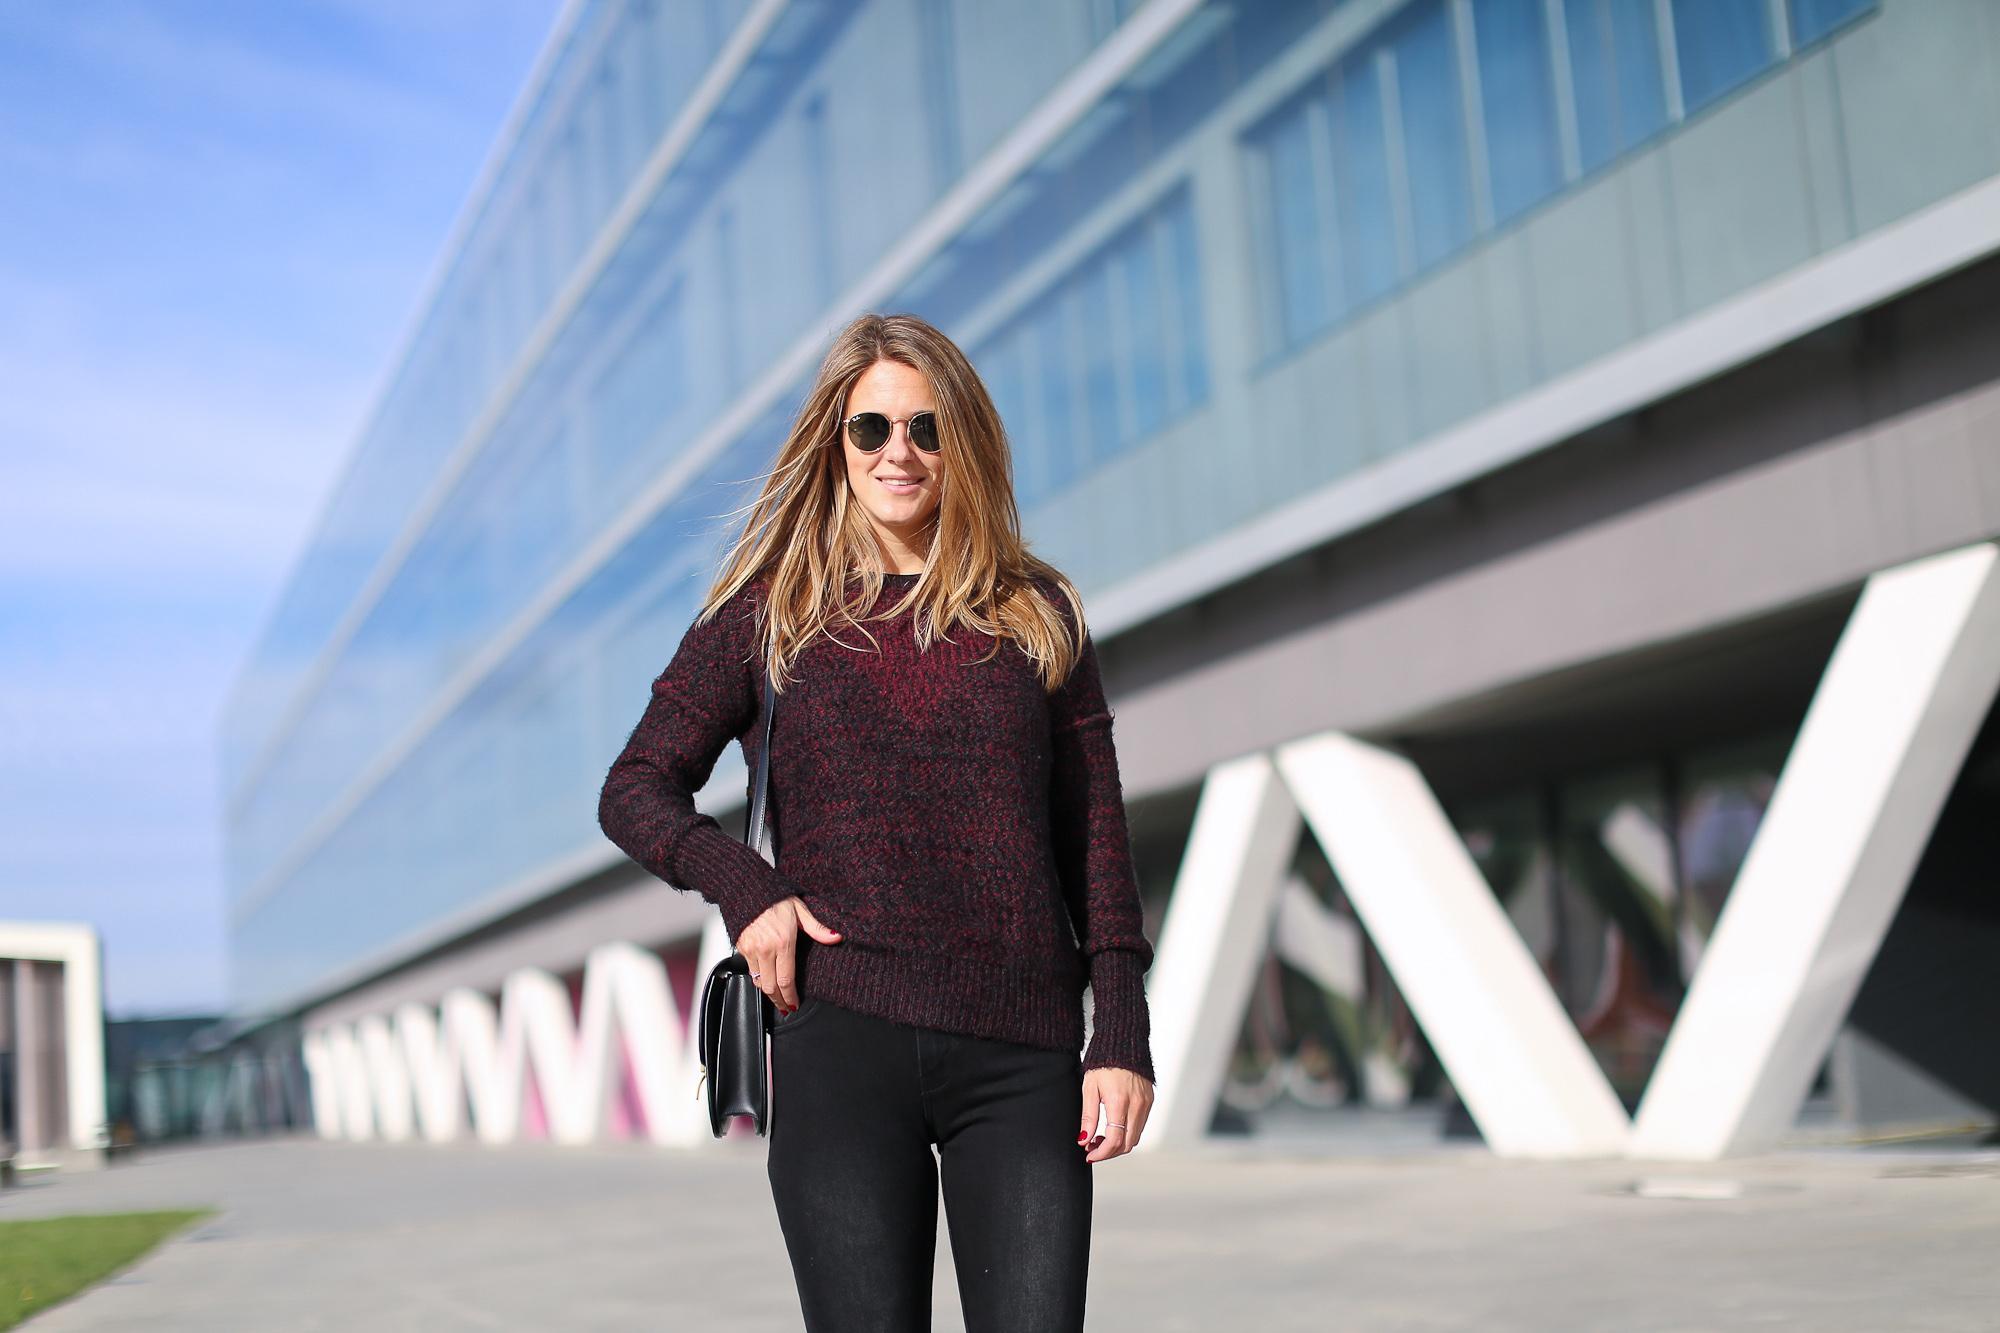 Clochet_streetstyle_fashionblogger_bilbao_zapatospielpertiniestampadoserpientepiton_zarajeansborlaspompones-5